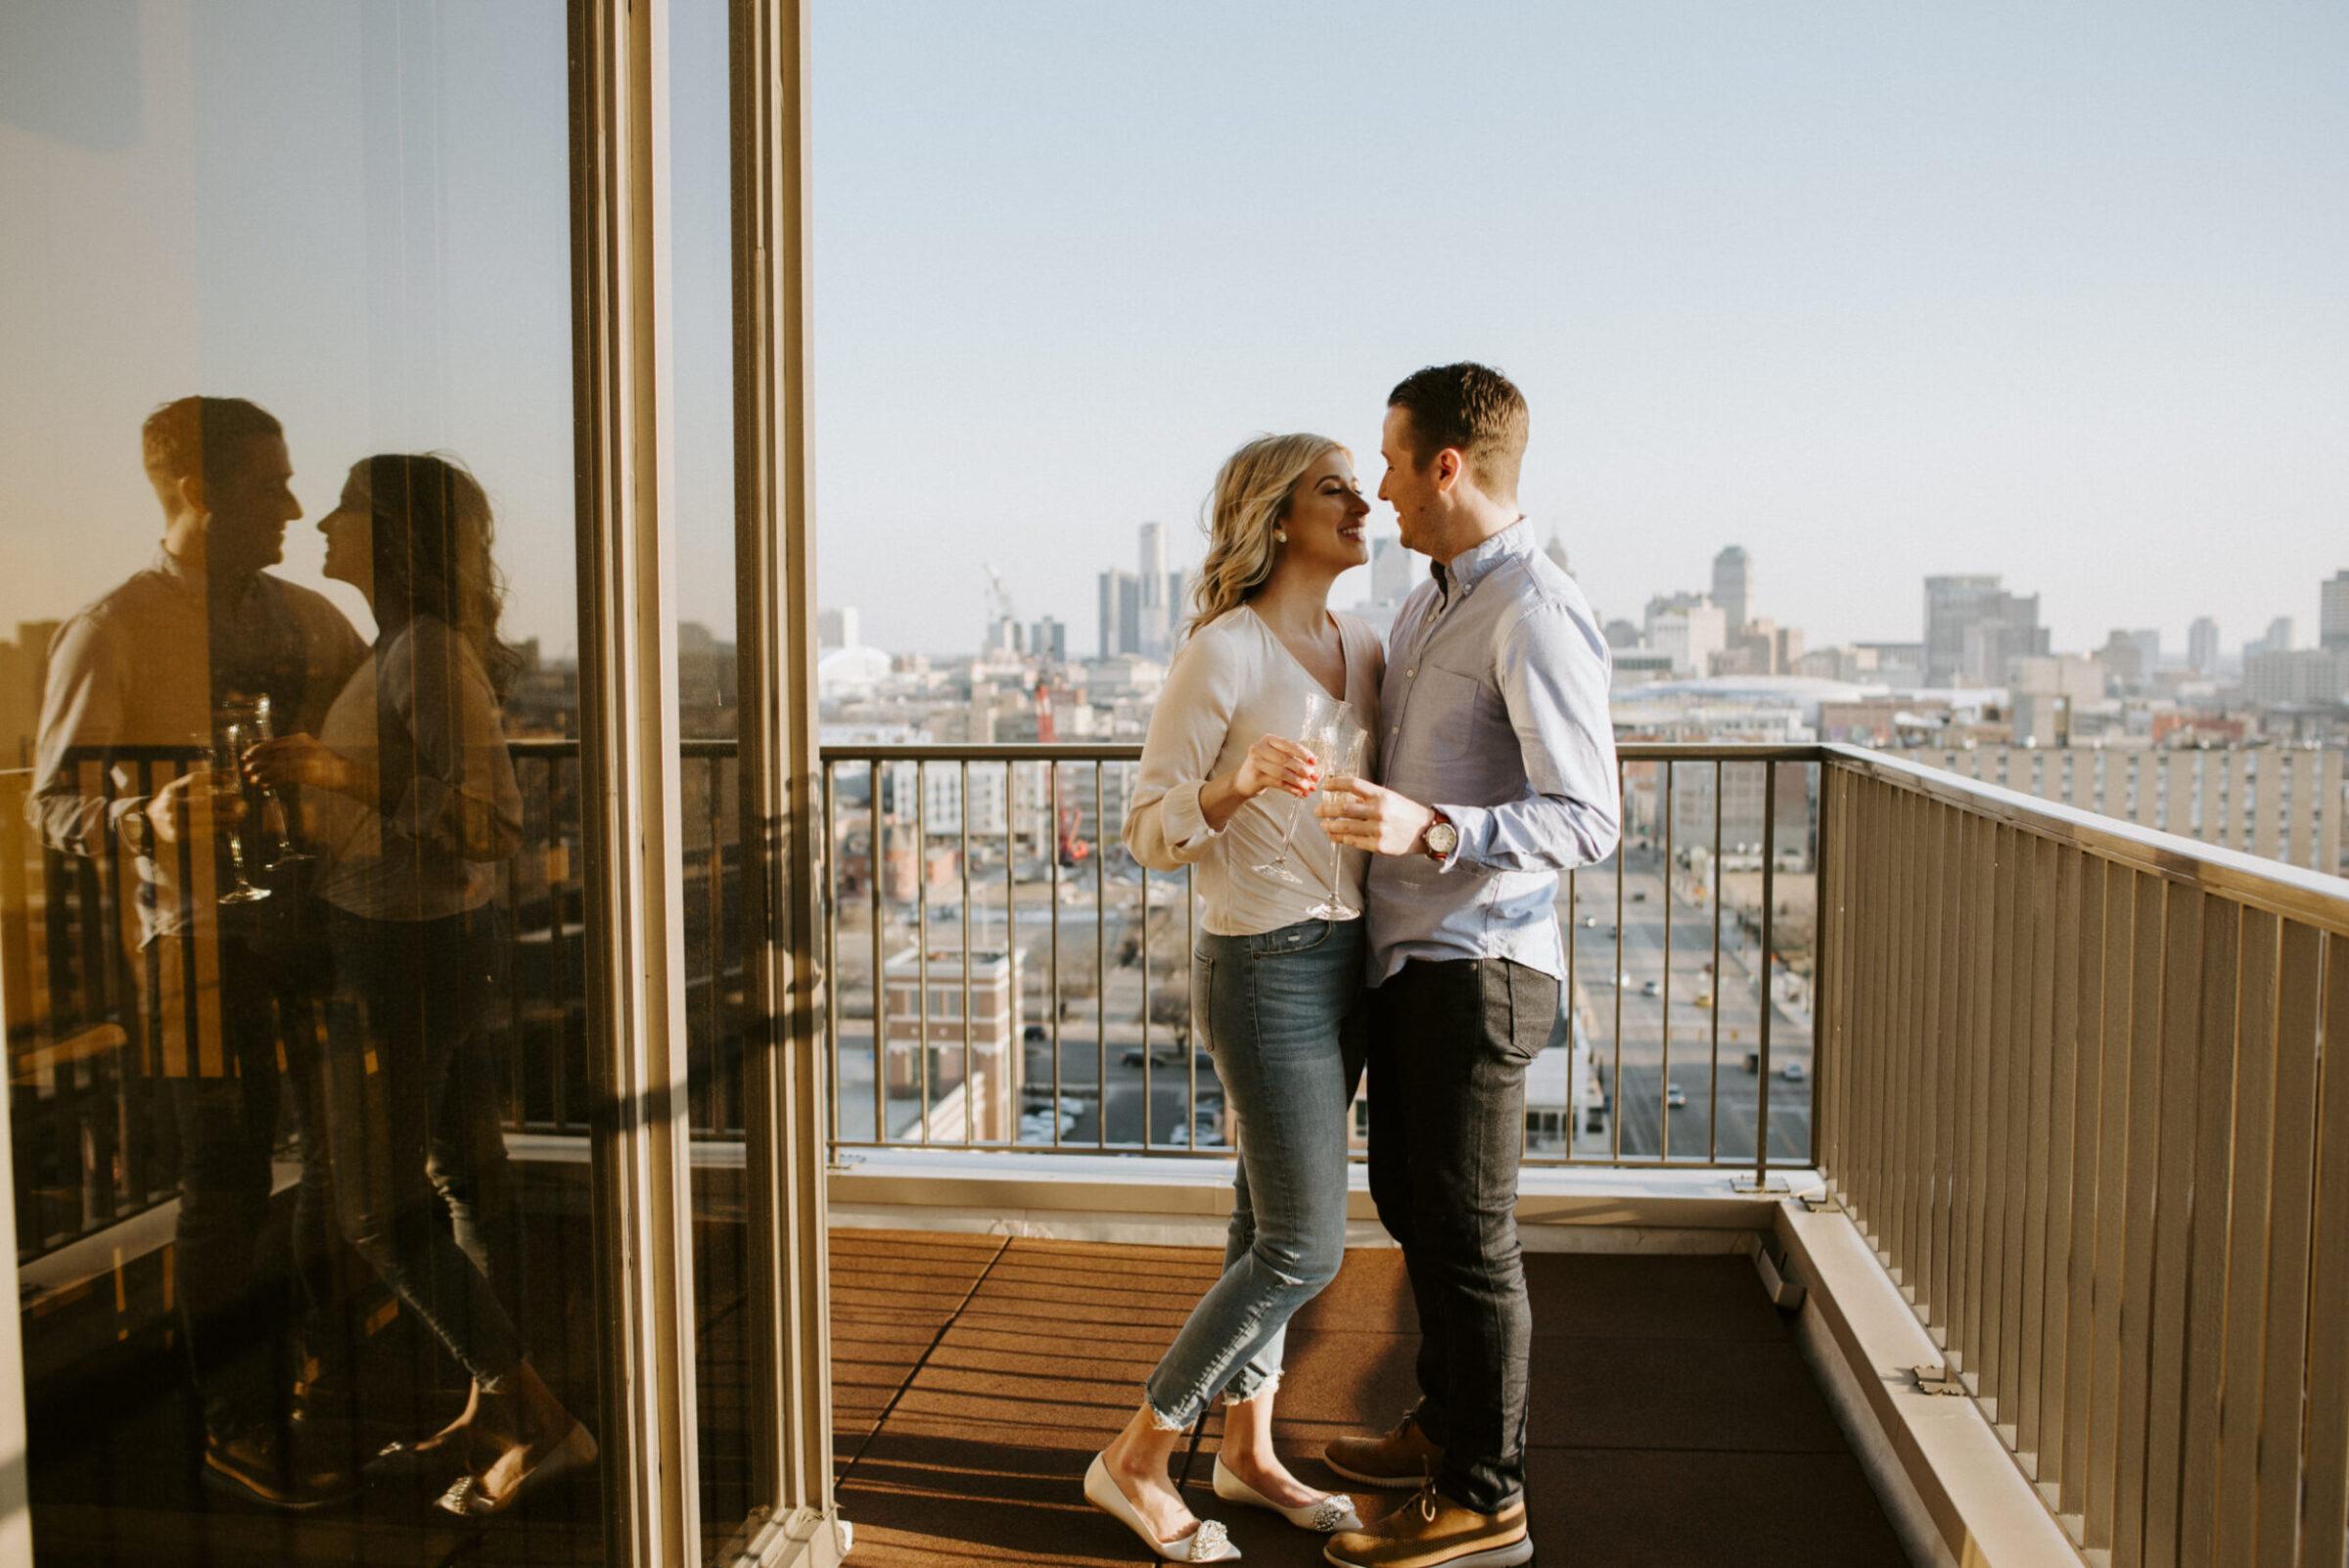 Wedding tip and advice for Michigan weddings